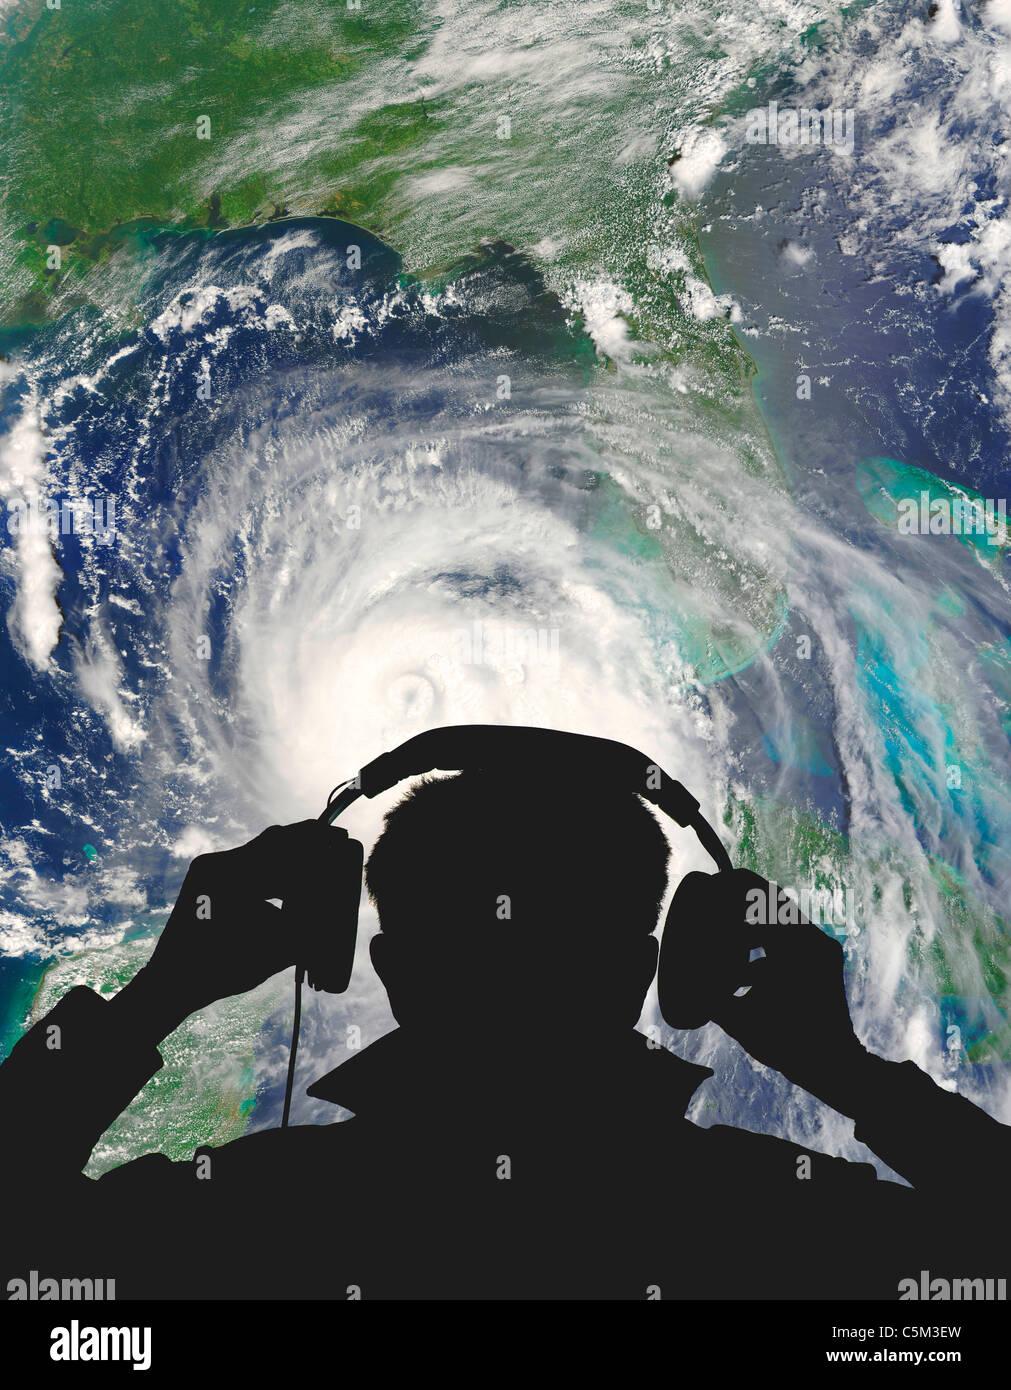 Hurrikan Katrina Wetter Ingenieur Stockfoto